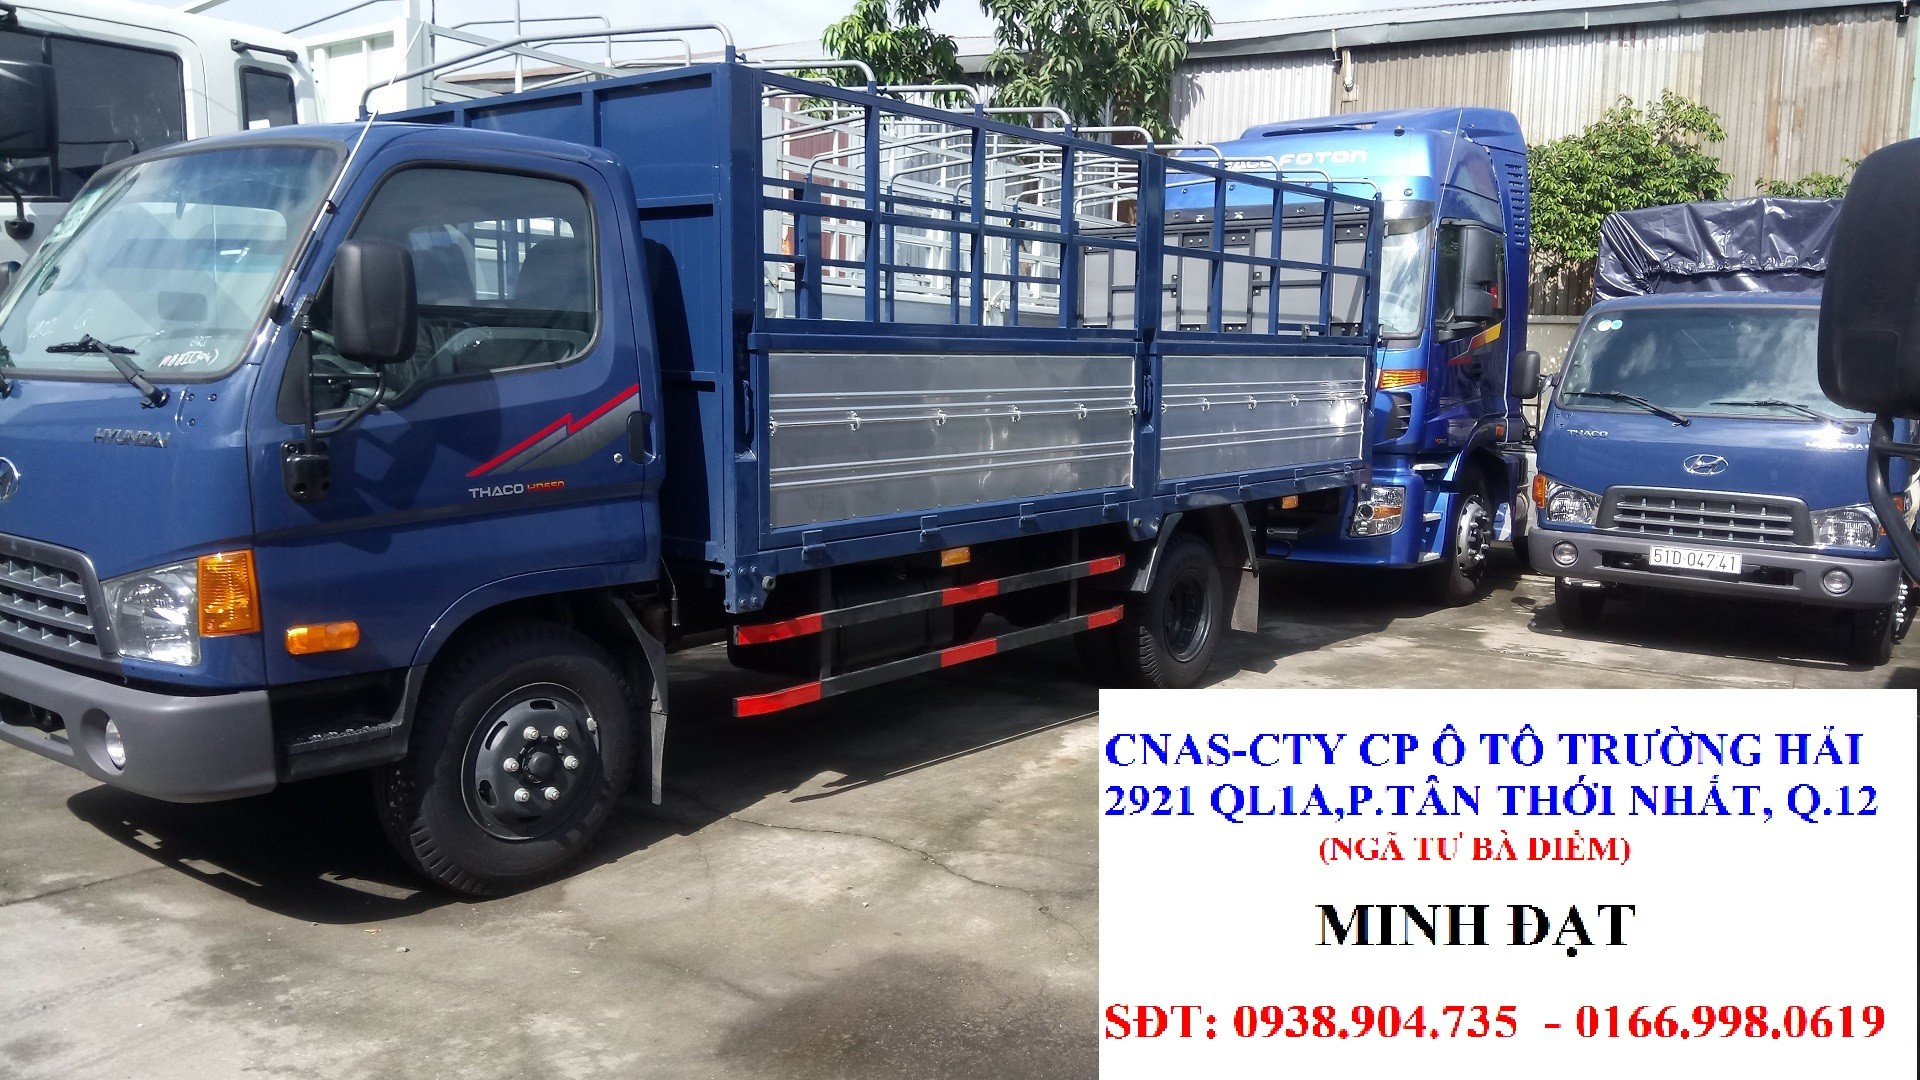 Bán xe tải HuynDai 6 tấn 5, xe tải HuynDai 5 tấn, xe tải thaco HuynDai 5 tấn, xe tải HuynDai 6t5 trả góp 2017 Ảnh số 41494337